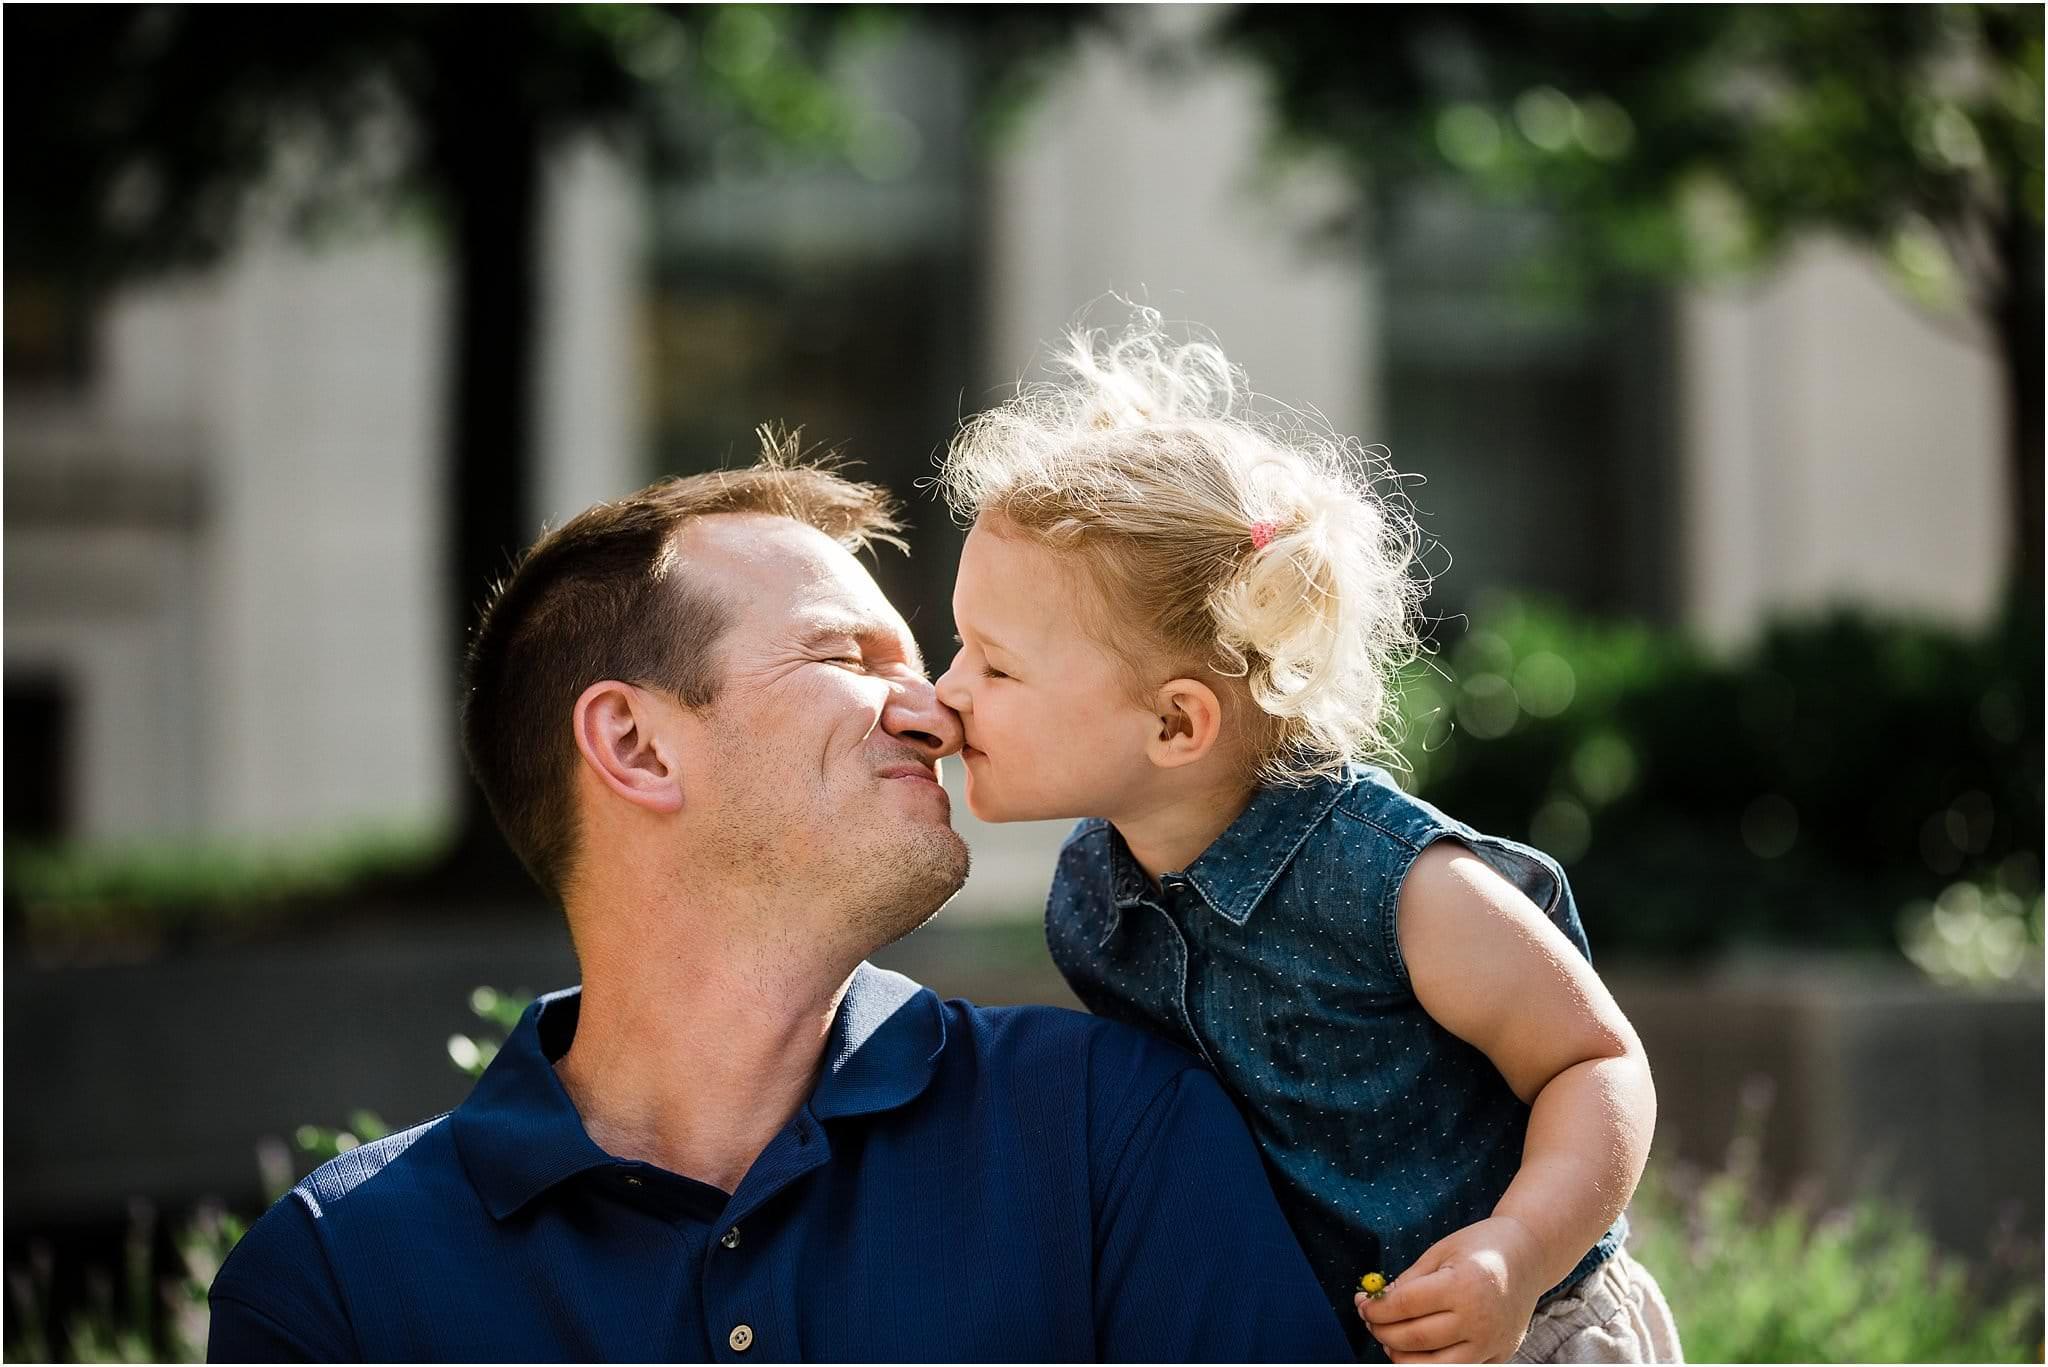 ugga mugga daddy daughter kiss